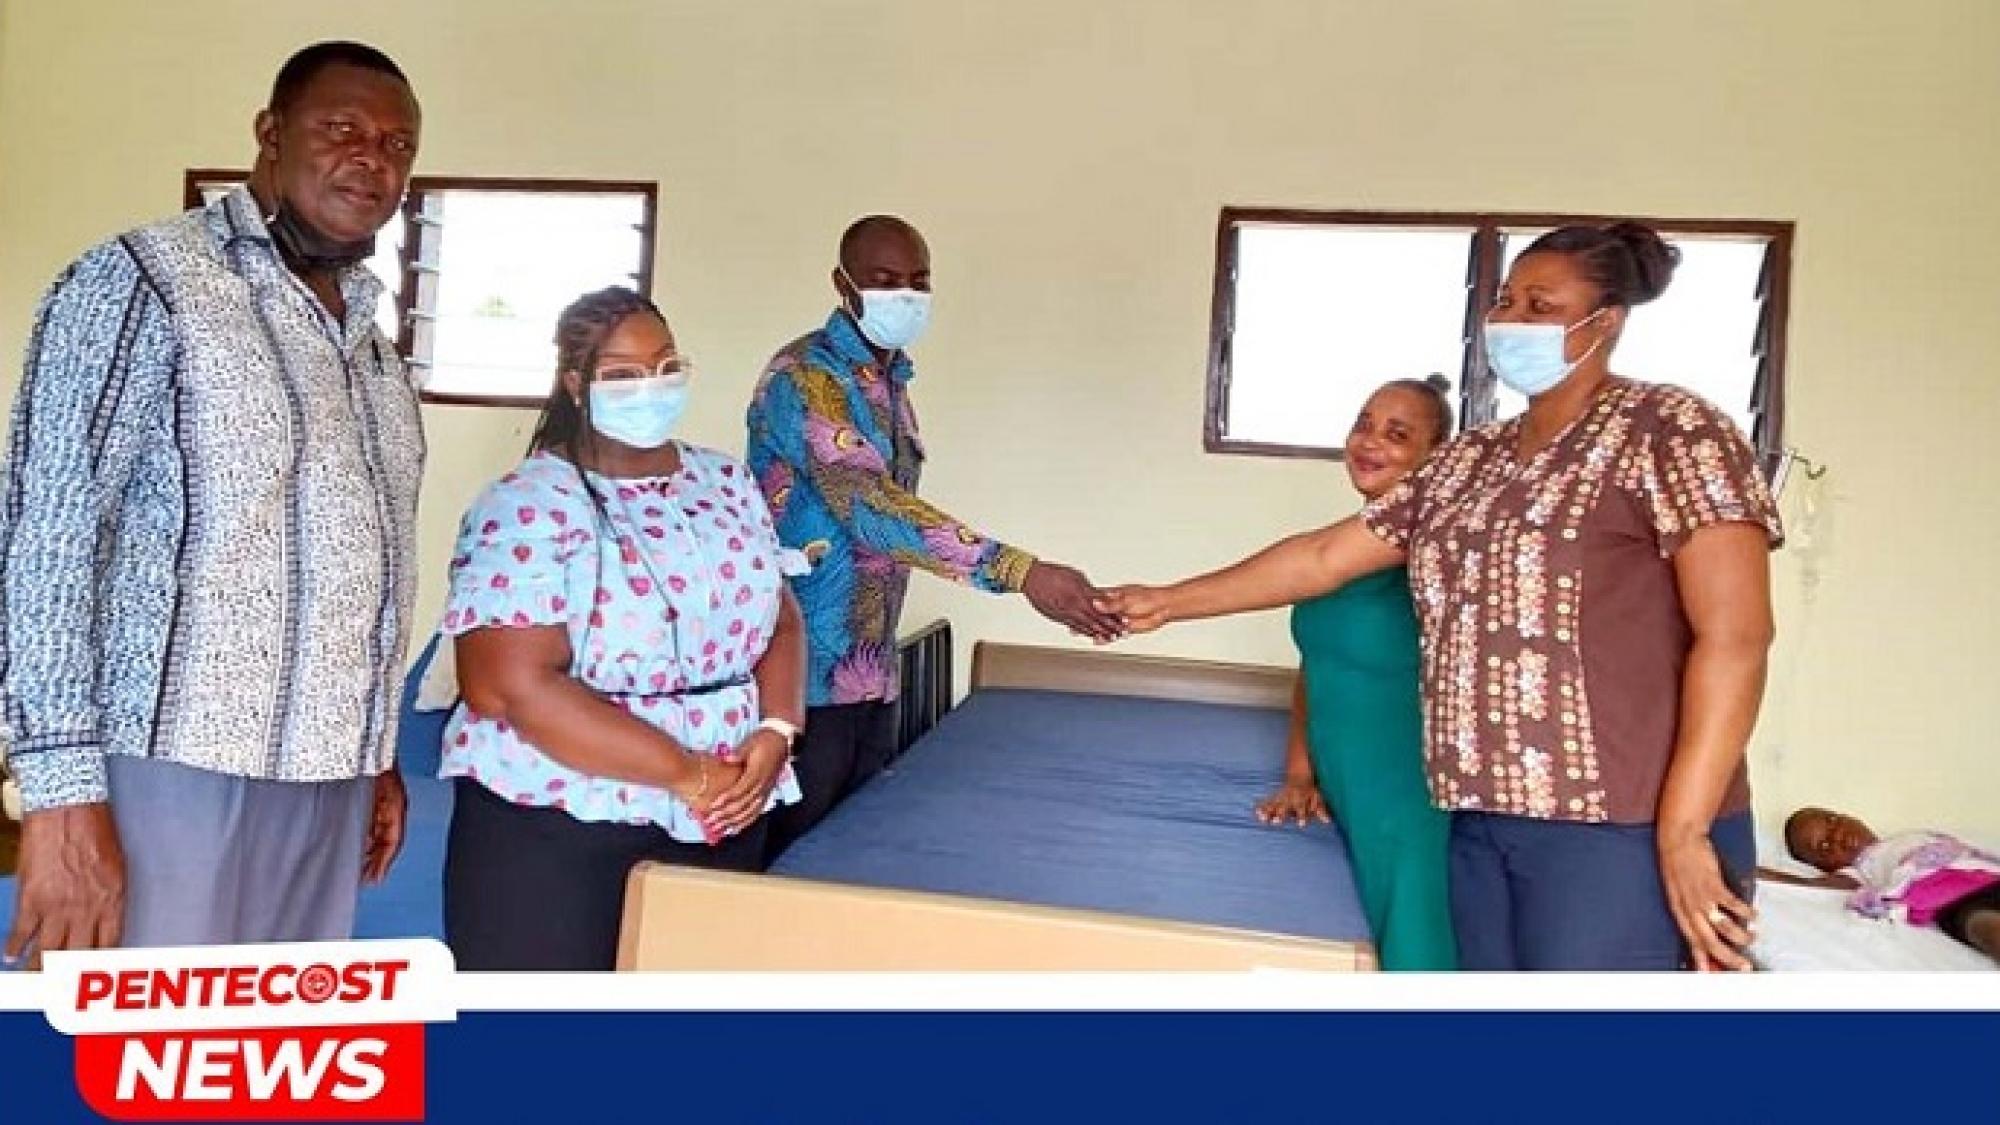 PENTSOS Donates Hospital